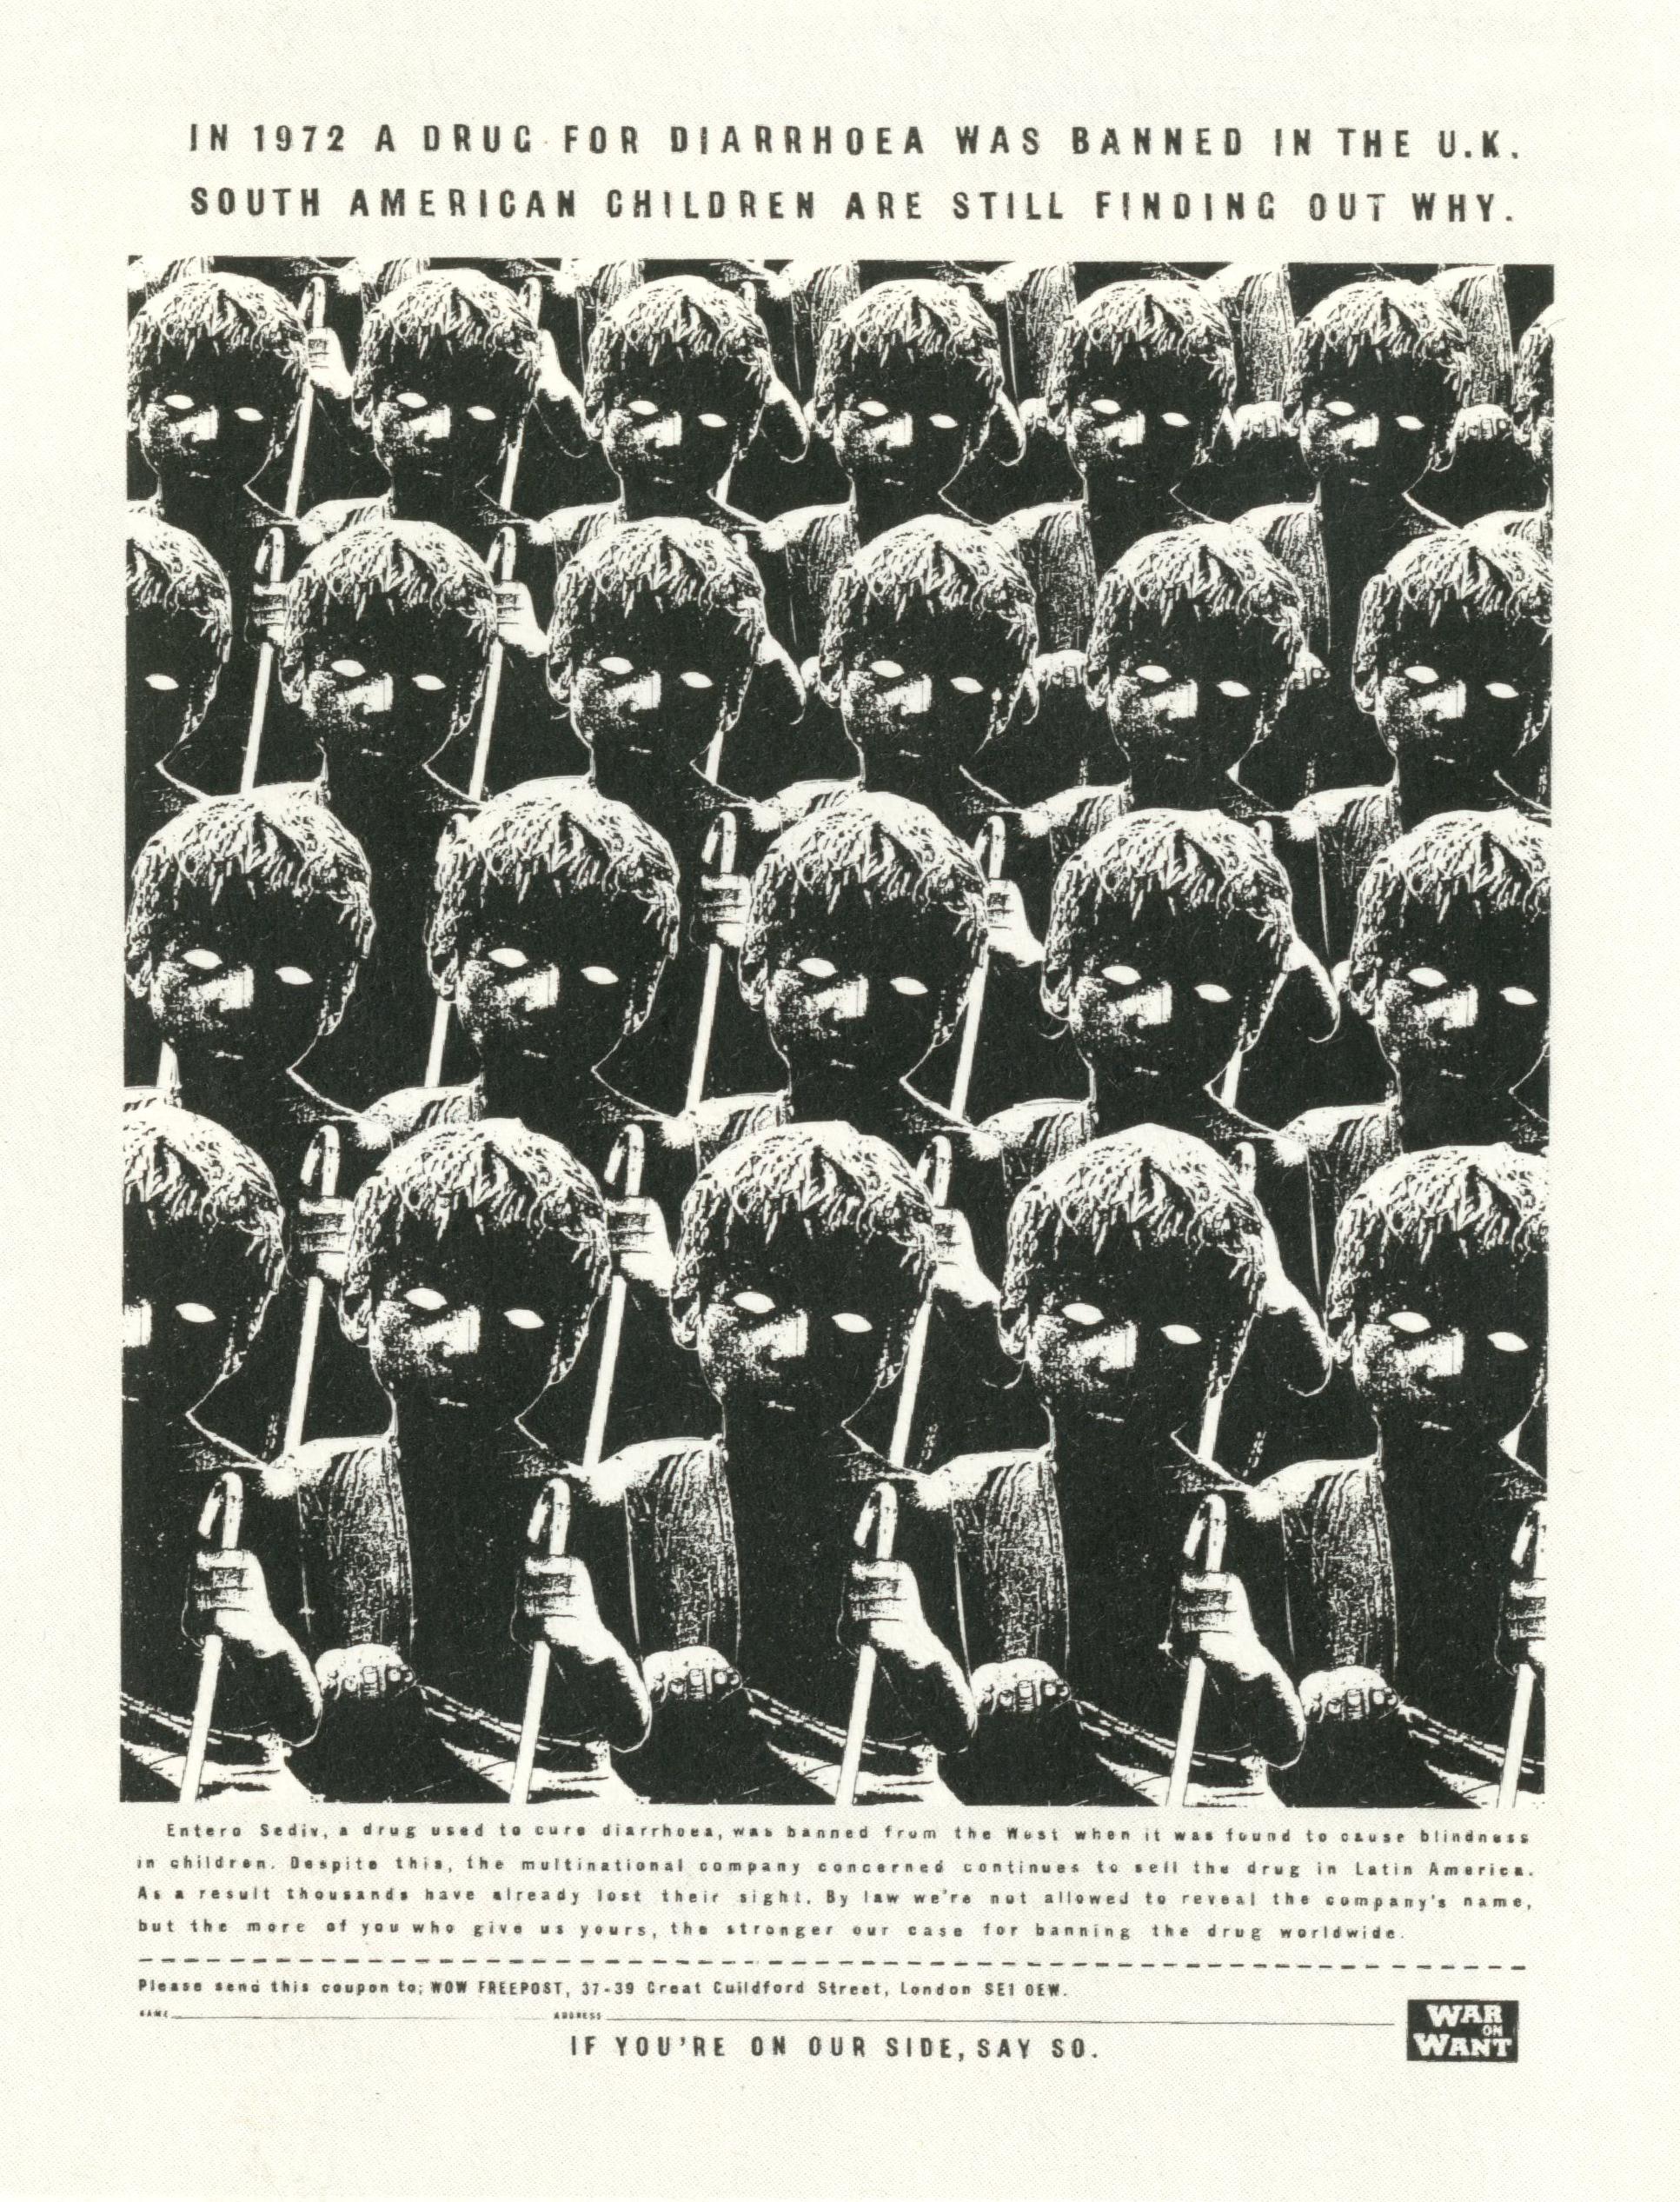 War On Want - '1972', Dave Wakefield, Tony Davidson, BMP:DDB